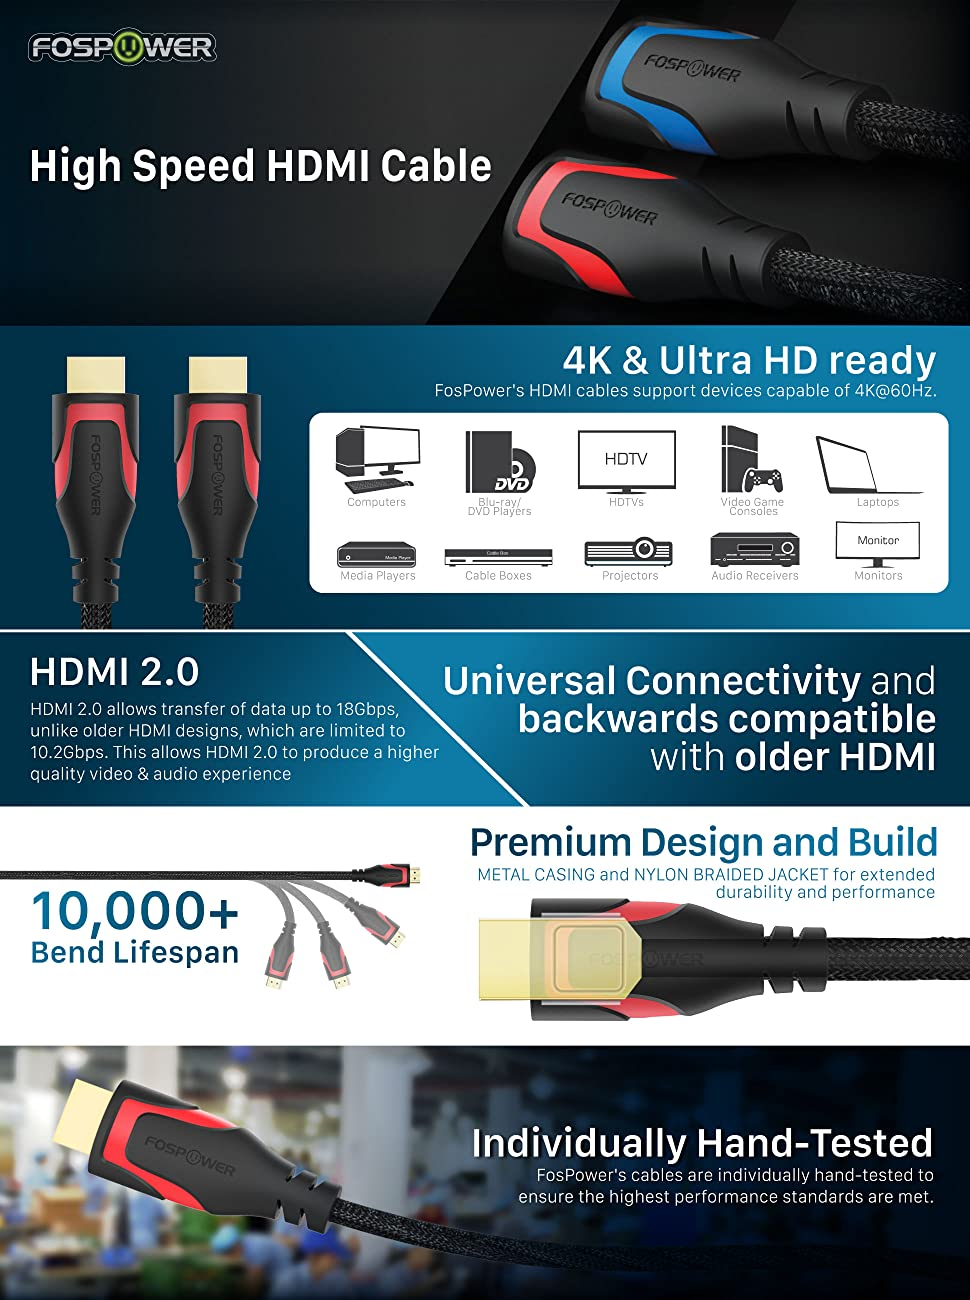 Amazon.com: HDMI Cable - 6FT, FosPower 4K Latest Standard 2.0 HDMI ...